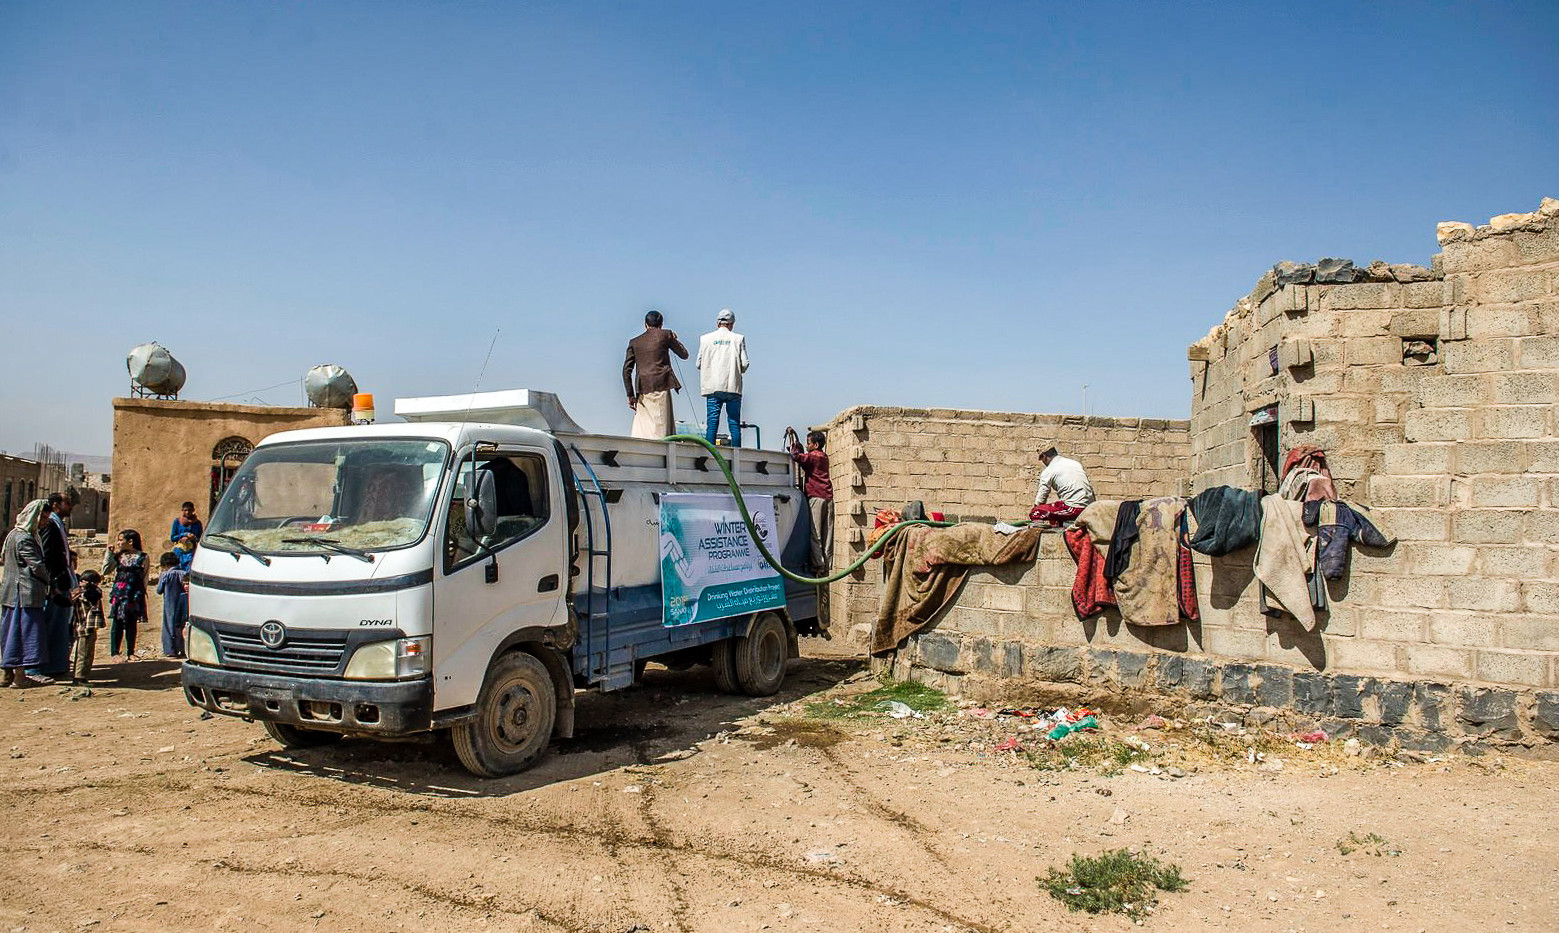 Water Tank built in Yemen